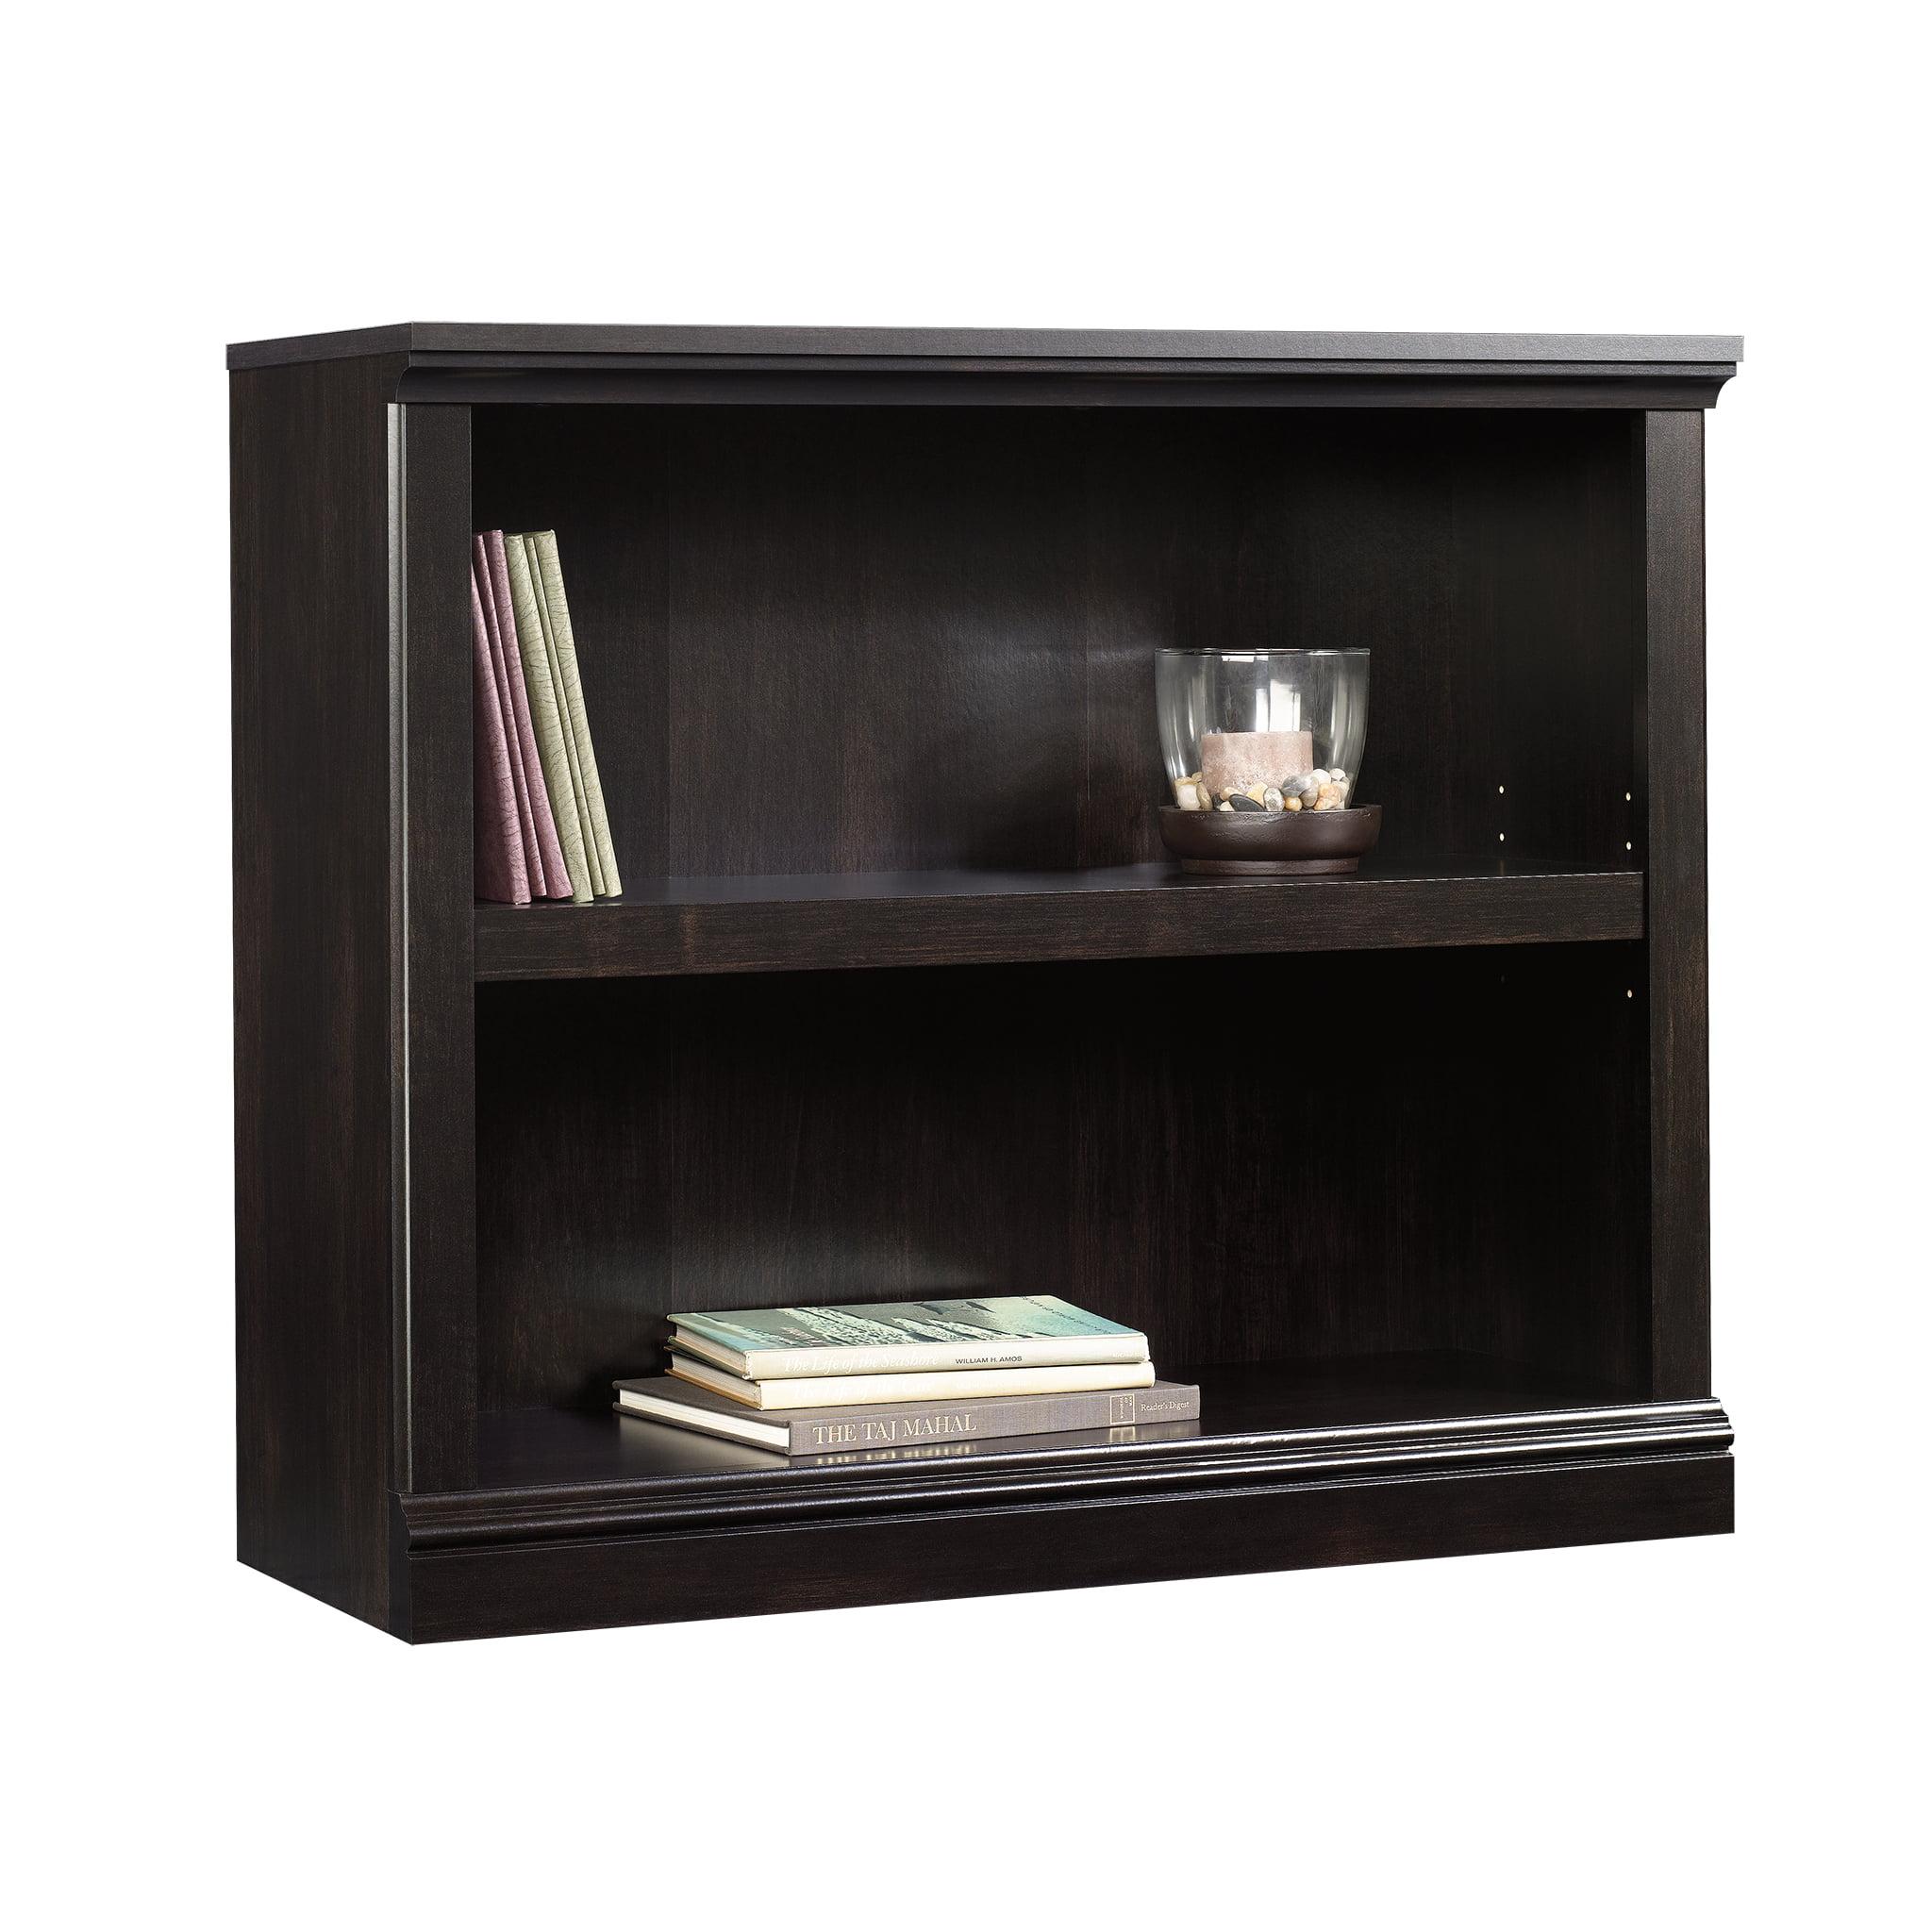 Sauder Select 2-Shelf Bookcase, Estate Black Finish - Walmart.com